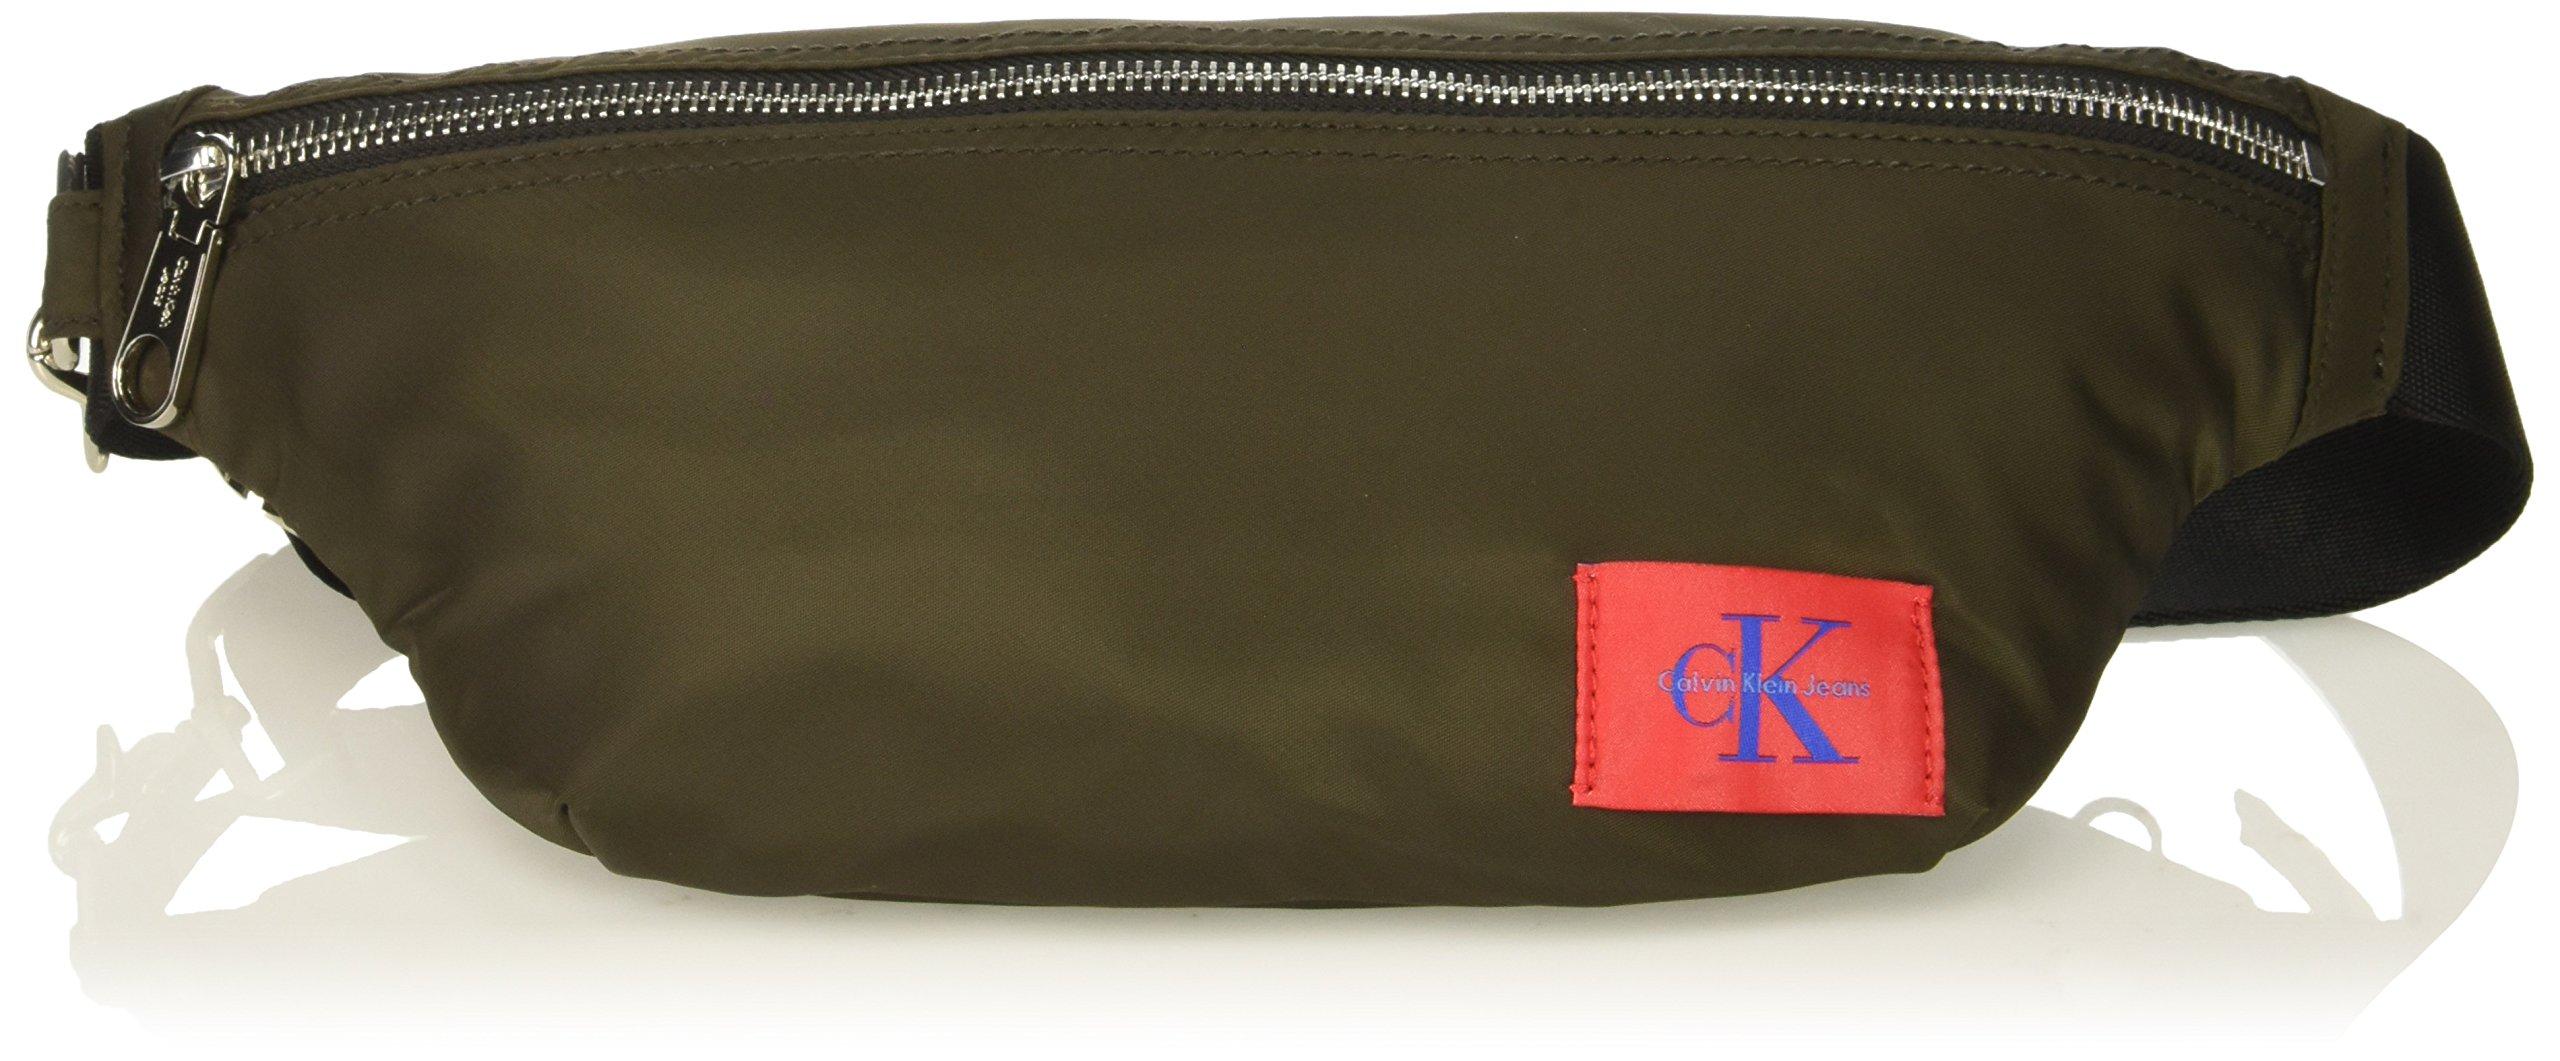 Calvin Klein Men's Zippered Belt Bag with Logo Patch, cargo, NO NO SIZE